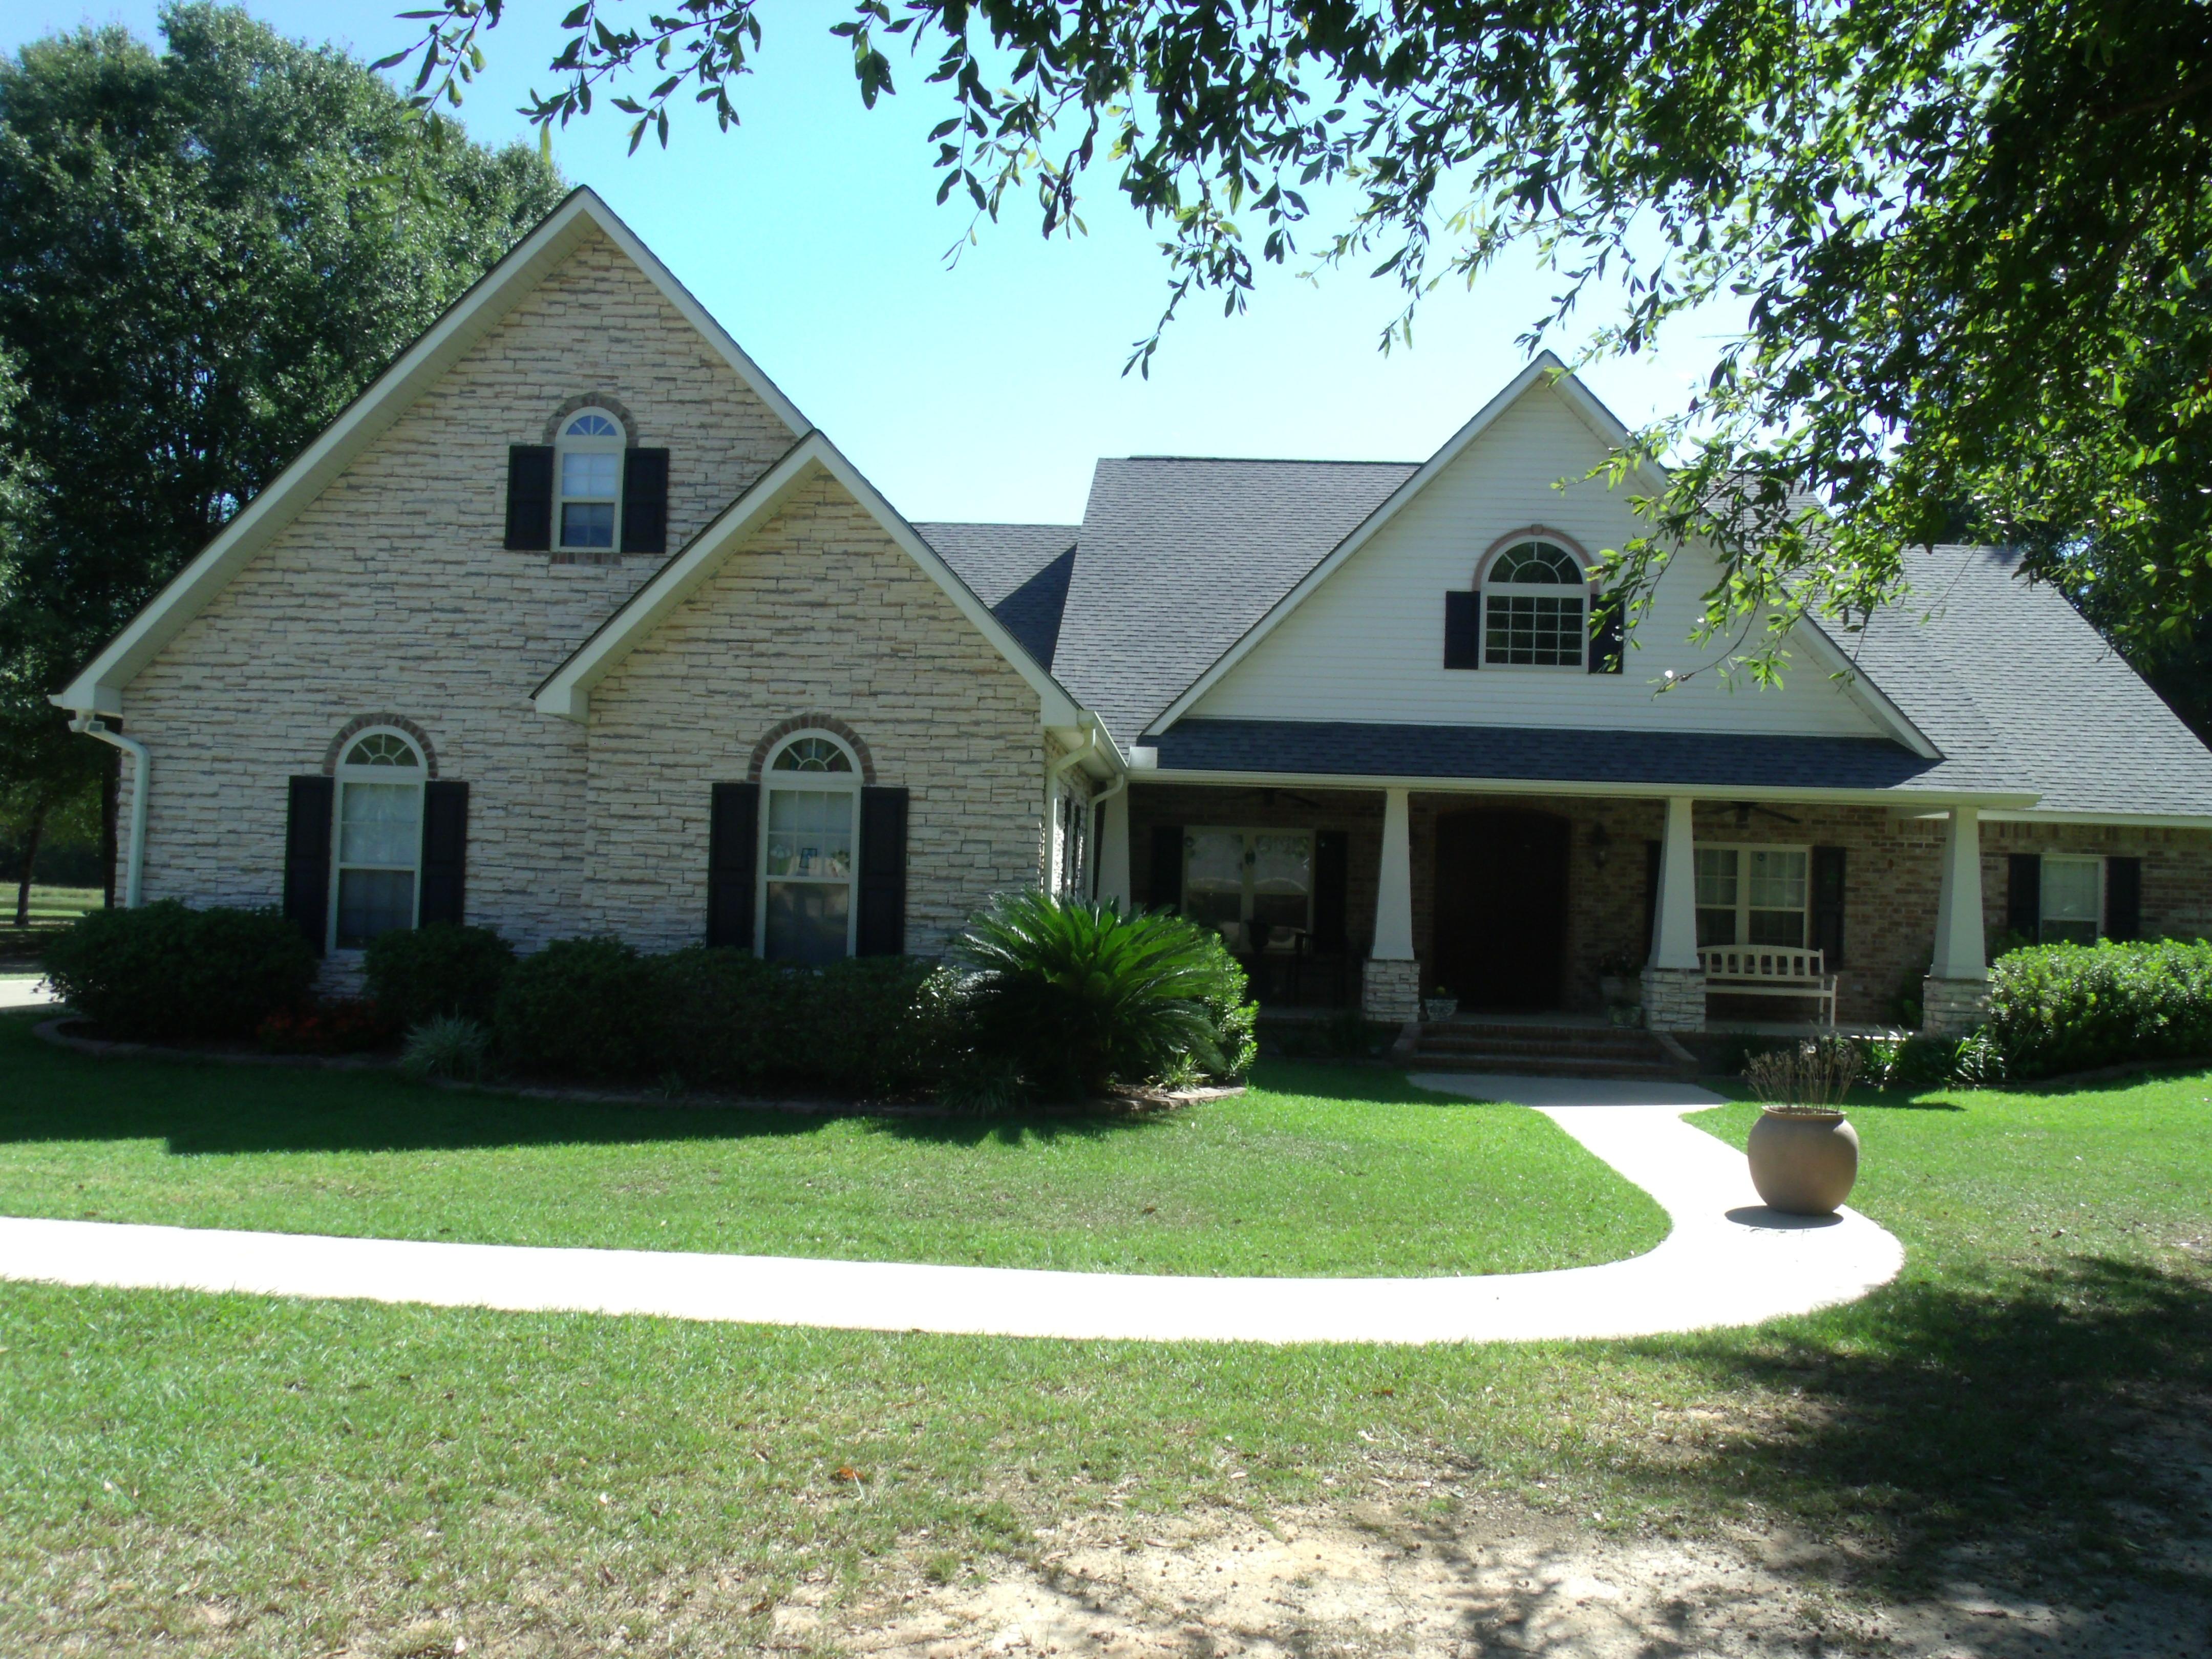 190 Blue Ridge Dr, Deridder, Louisiana 70634